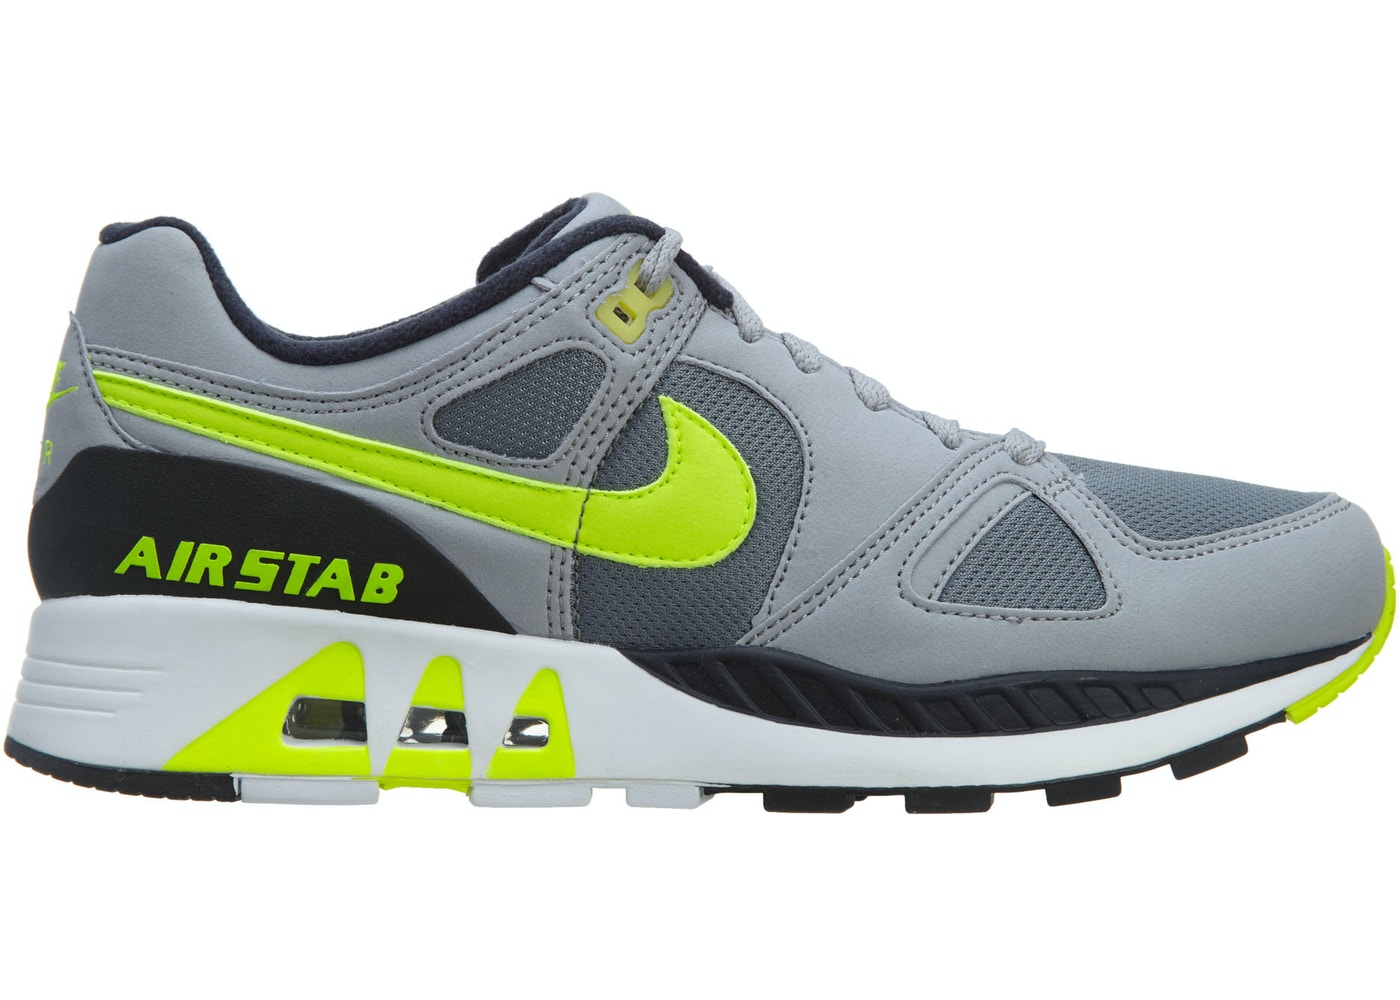 Nike Air Stab Cool Grey Volt-Wolf Grey-Anthrct - 312451-003 1499d0850